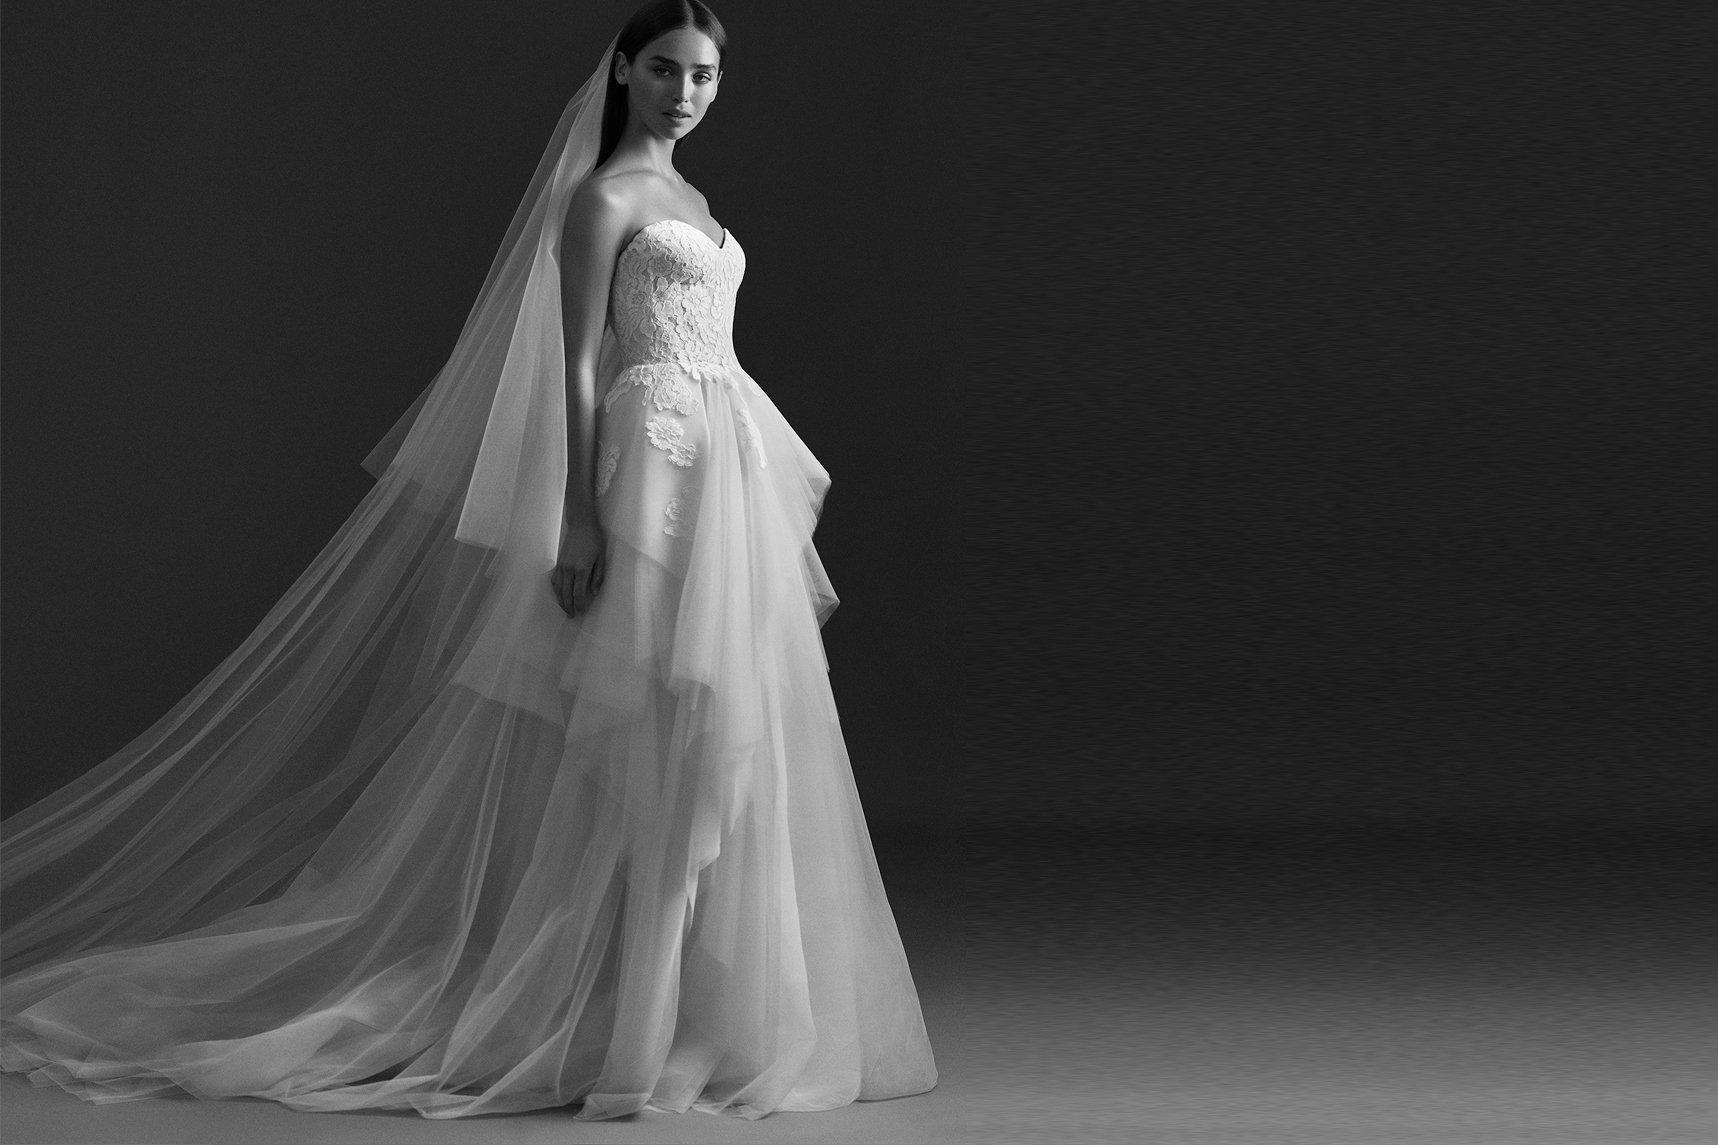 allison-webb-bridal-fall-2018-style-4852